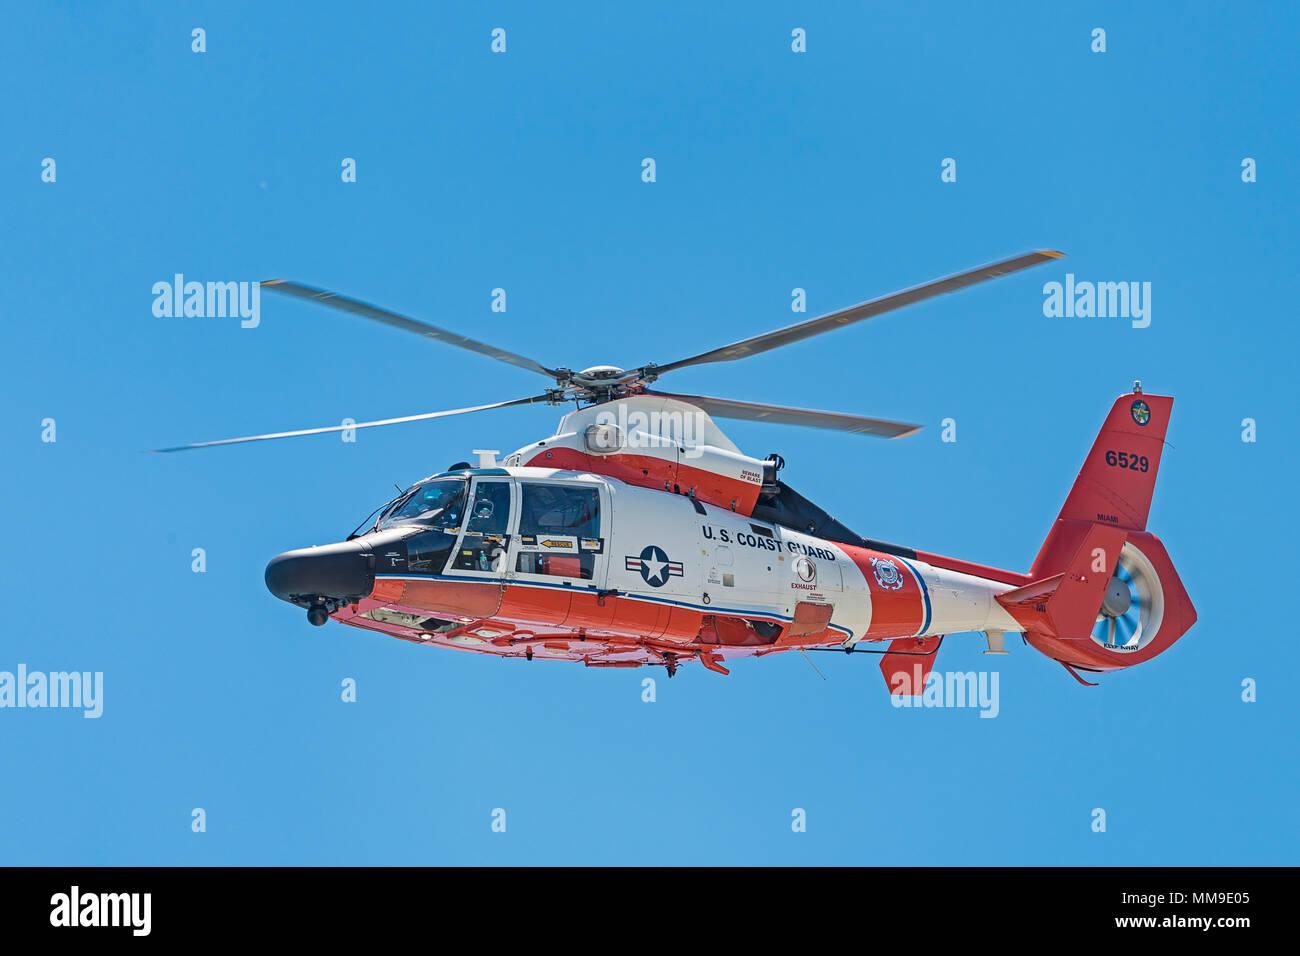 Us Coast Guard Helicopter Stock Photos & Us Coast Guard